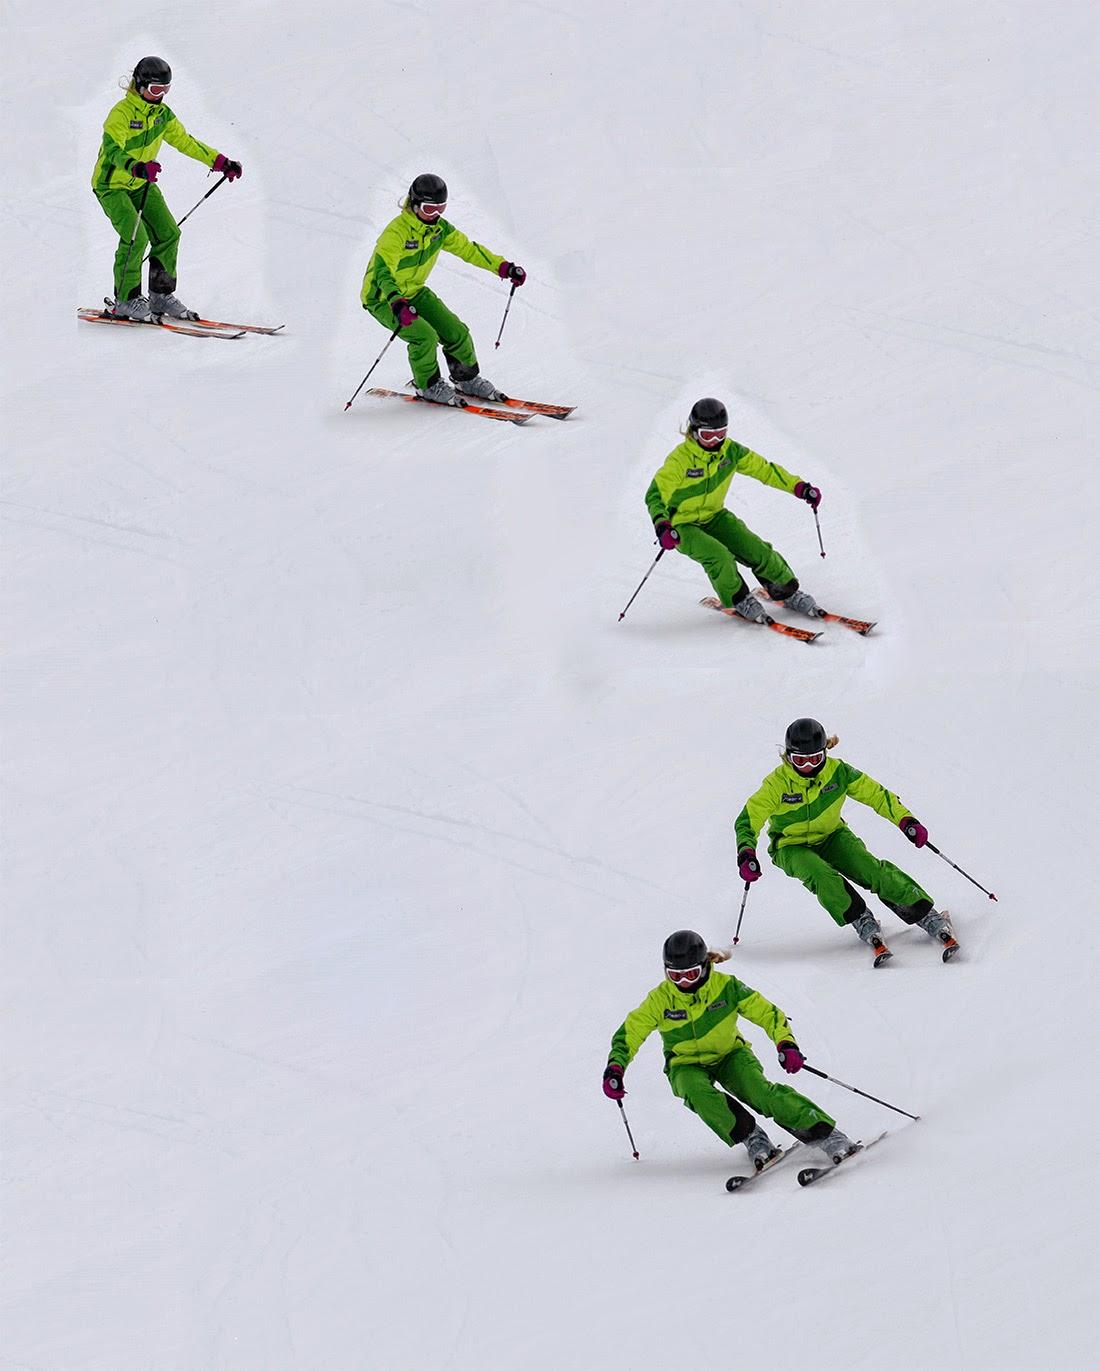 Online Škola skijanja carving kanting talierung